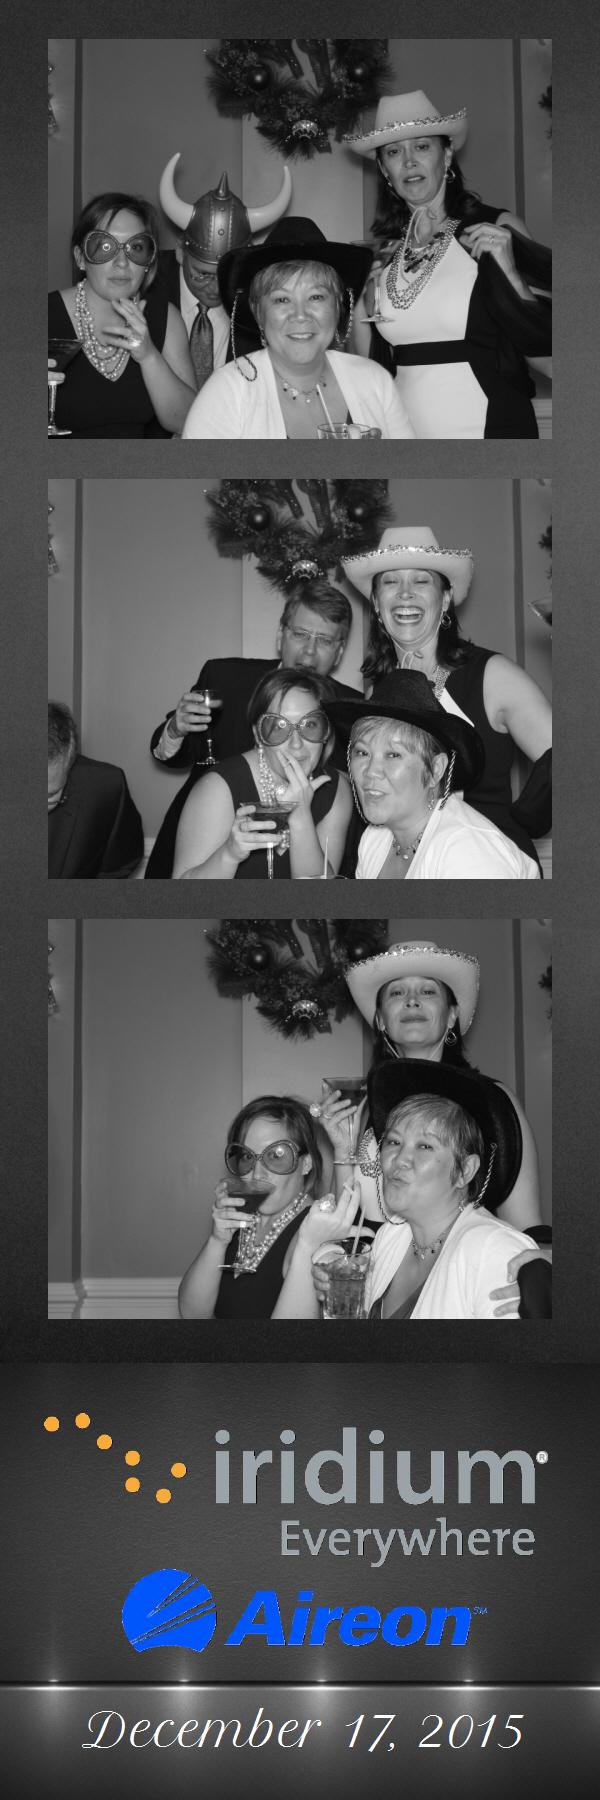 Guest House Events Photo Booth Iridium (40).jpg